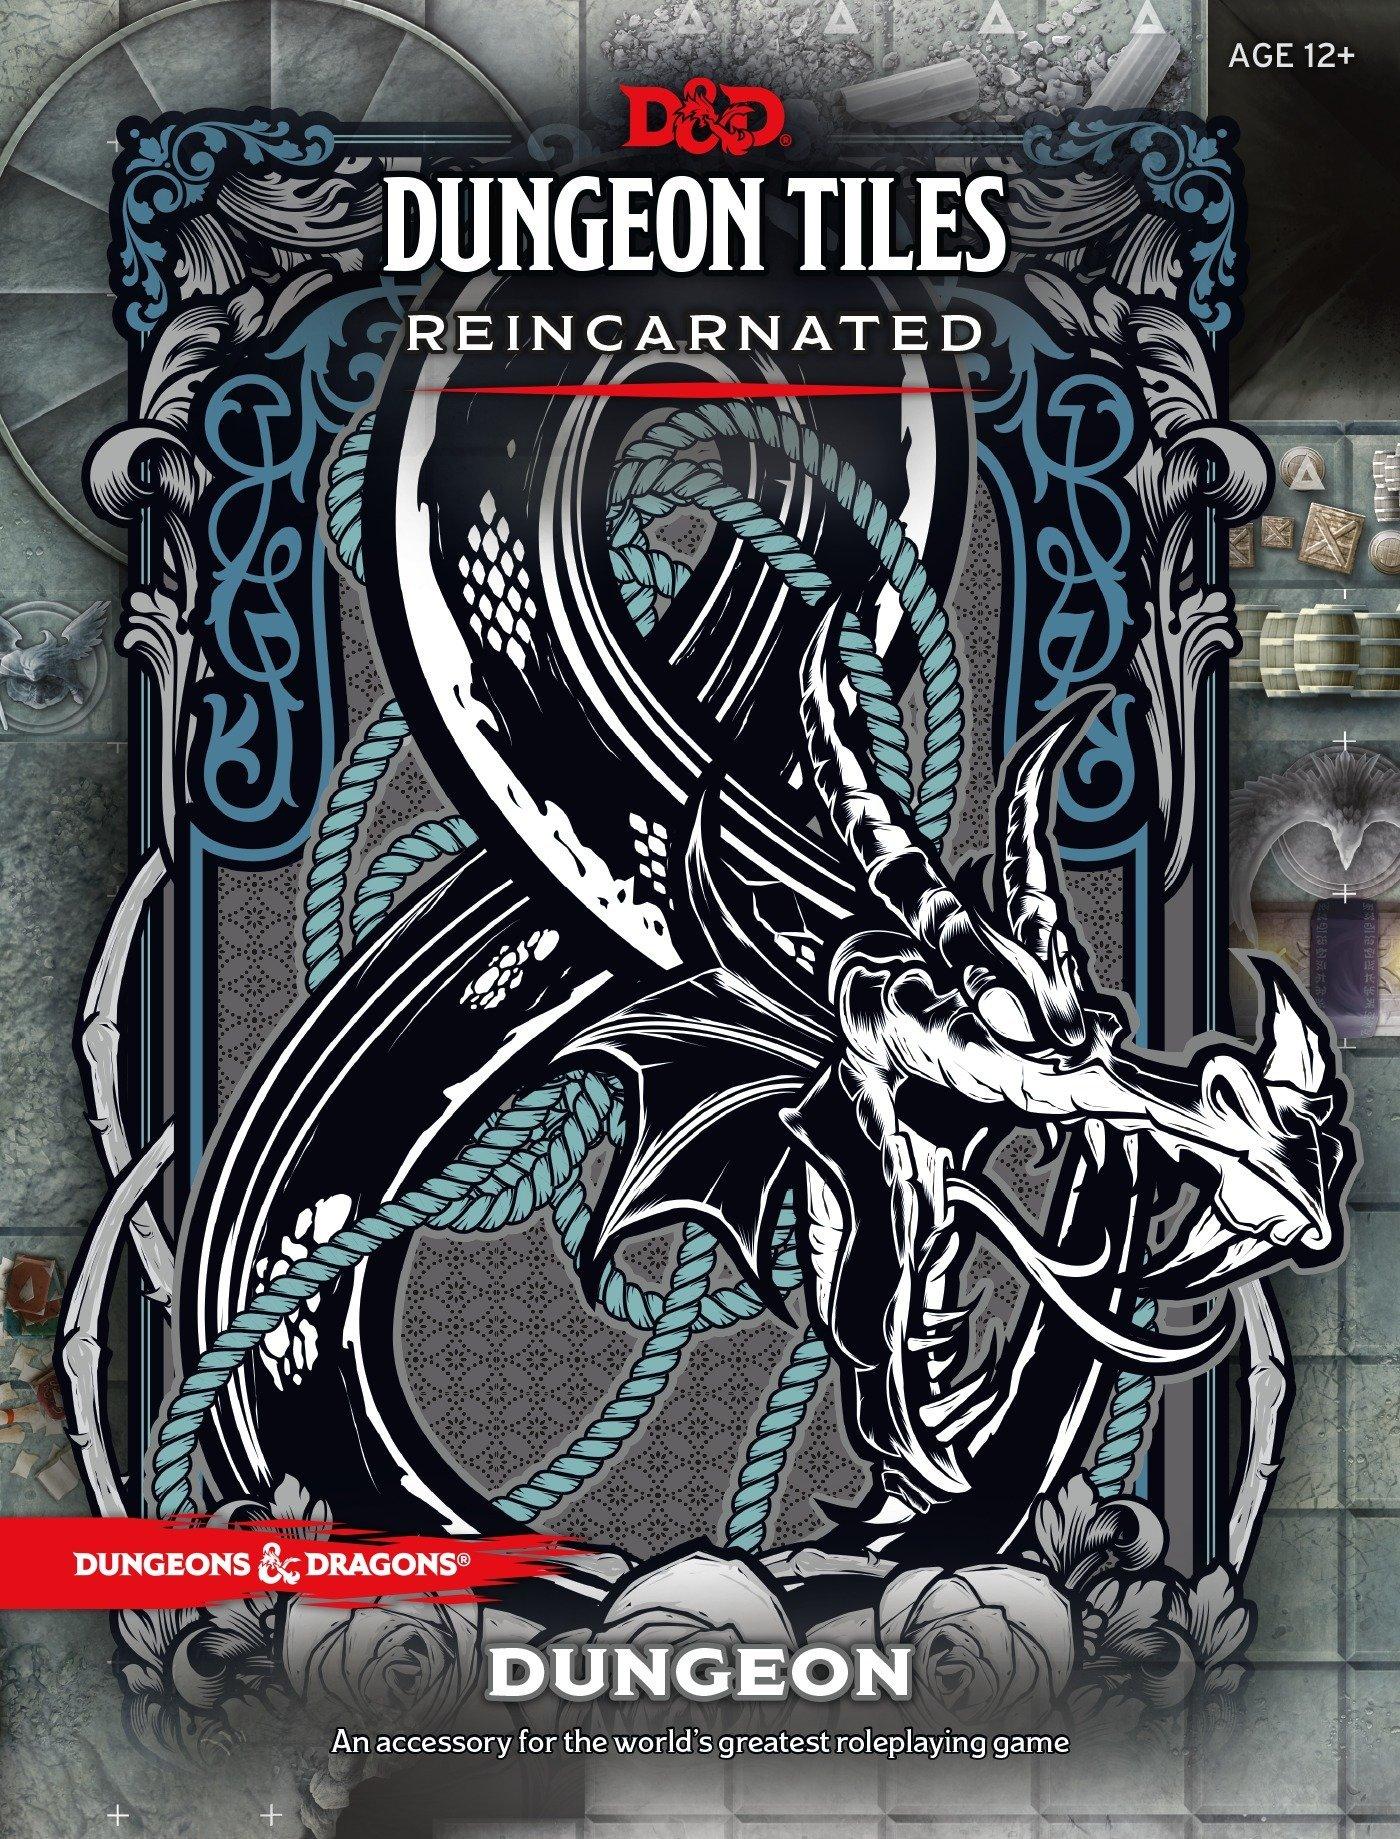 D&d Dungeon Tiles Reincarnated: Dungeon: Amazon.es: Wizards Rpg Team: Libros en idiomas extranjeros